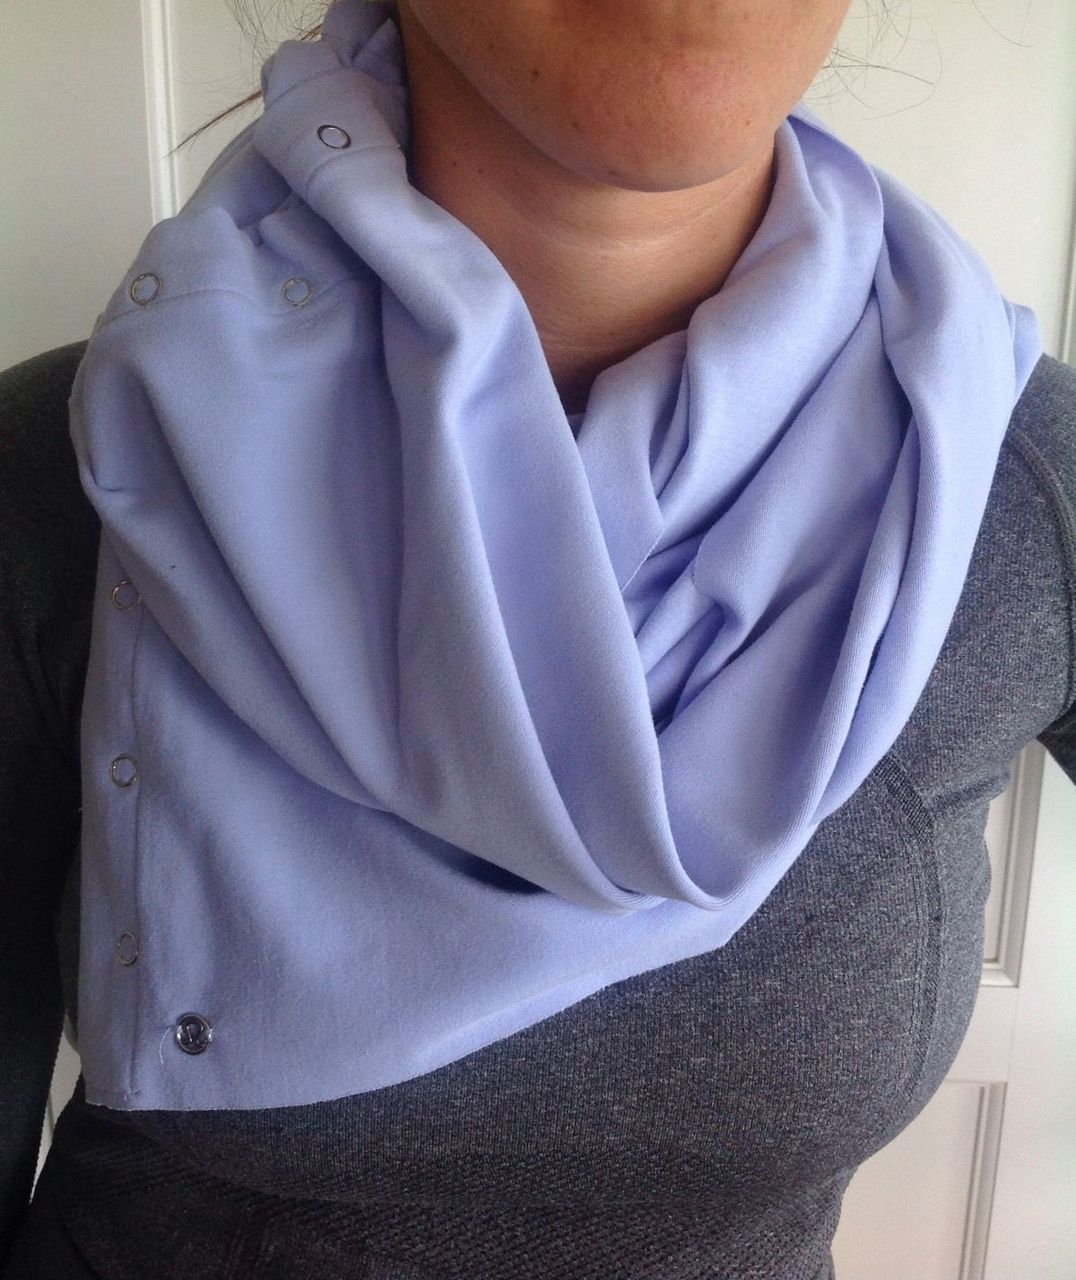 Lululemon Vinyasa Scarf *Rulu - Lavender Dusk /  Heathered Lavender Dusk